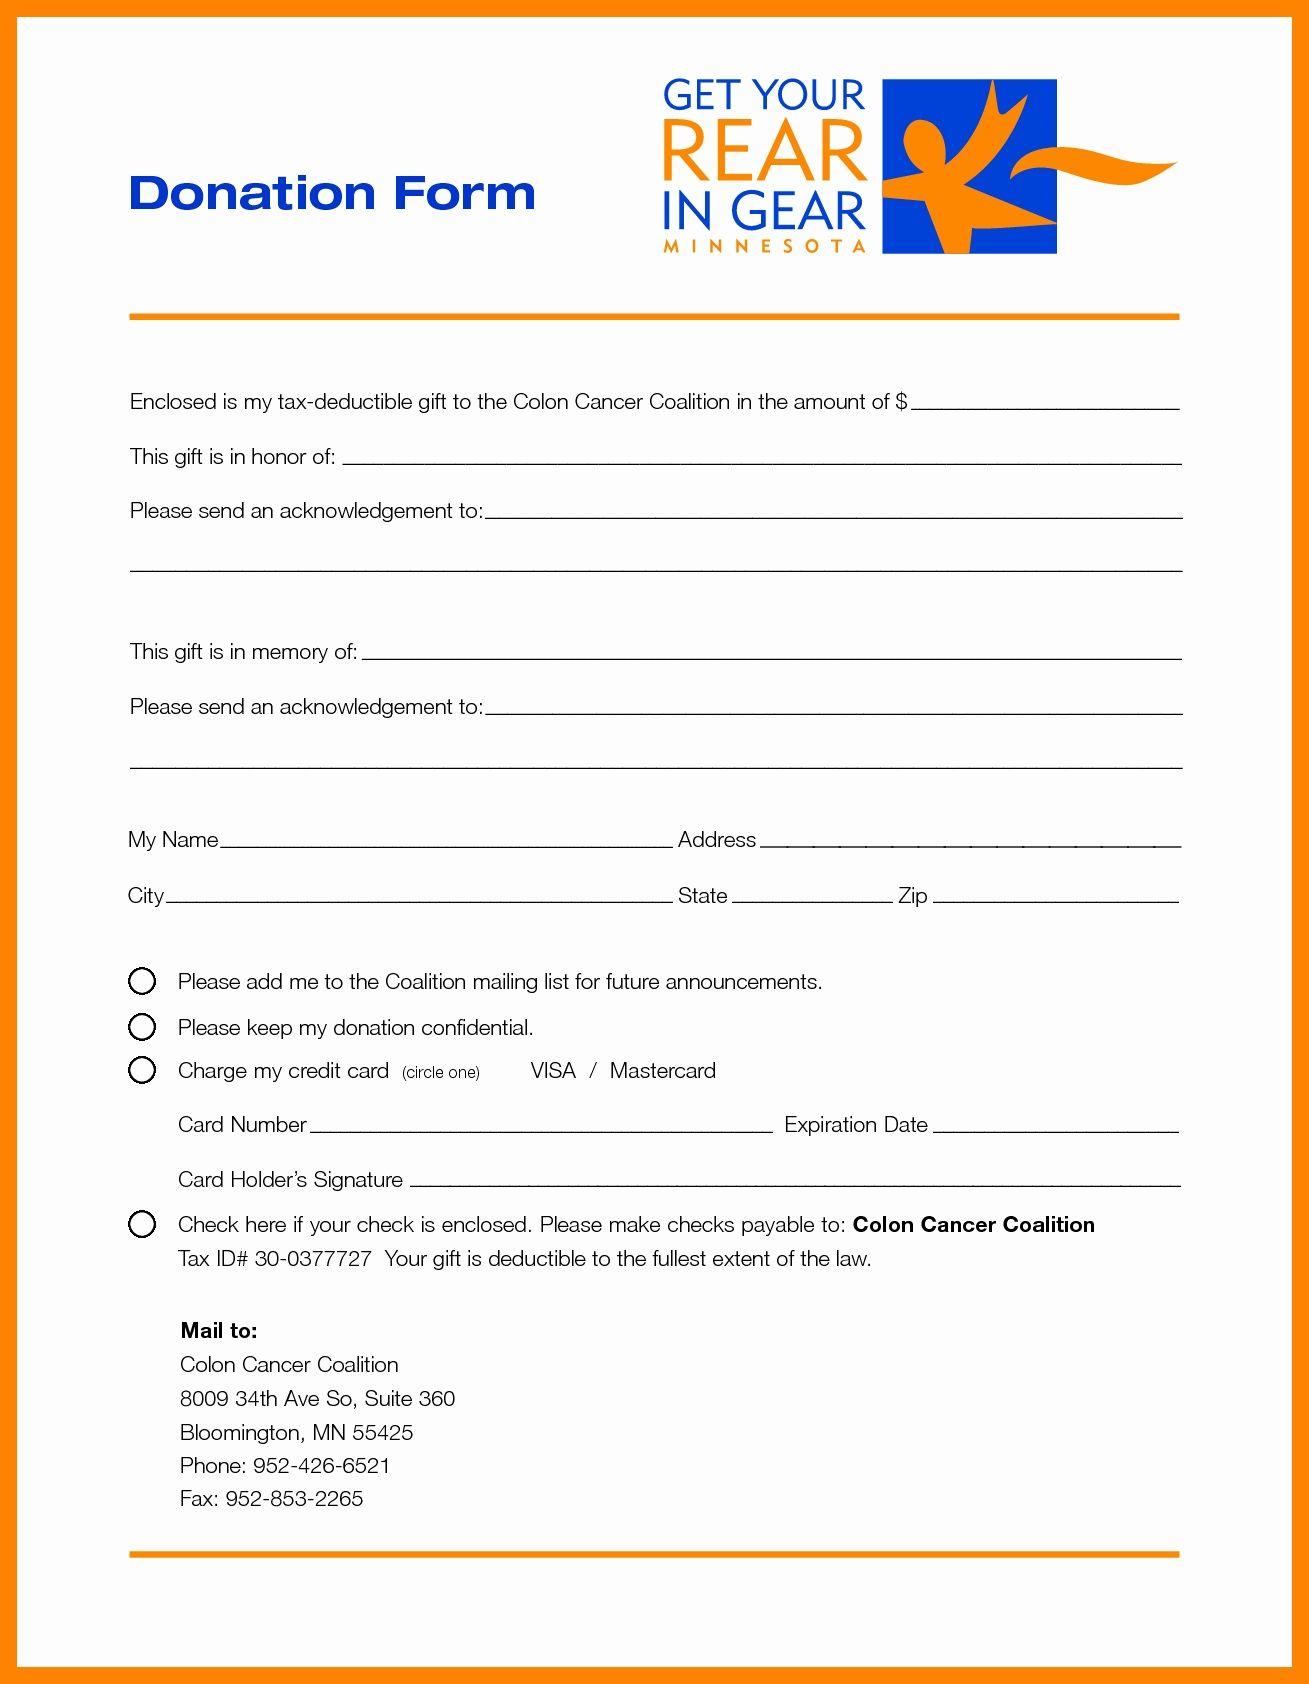 Excel templates for church contributions best of pledge form excel templates for church contributions best of pledge form template pdf hatch urbanskript altavistaventures Images